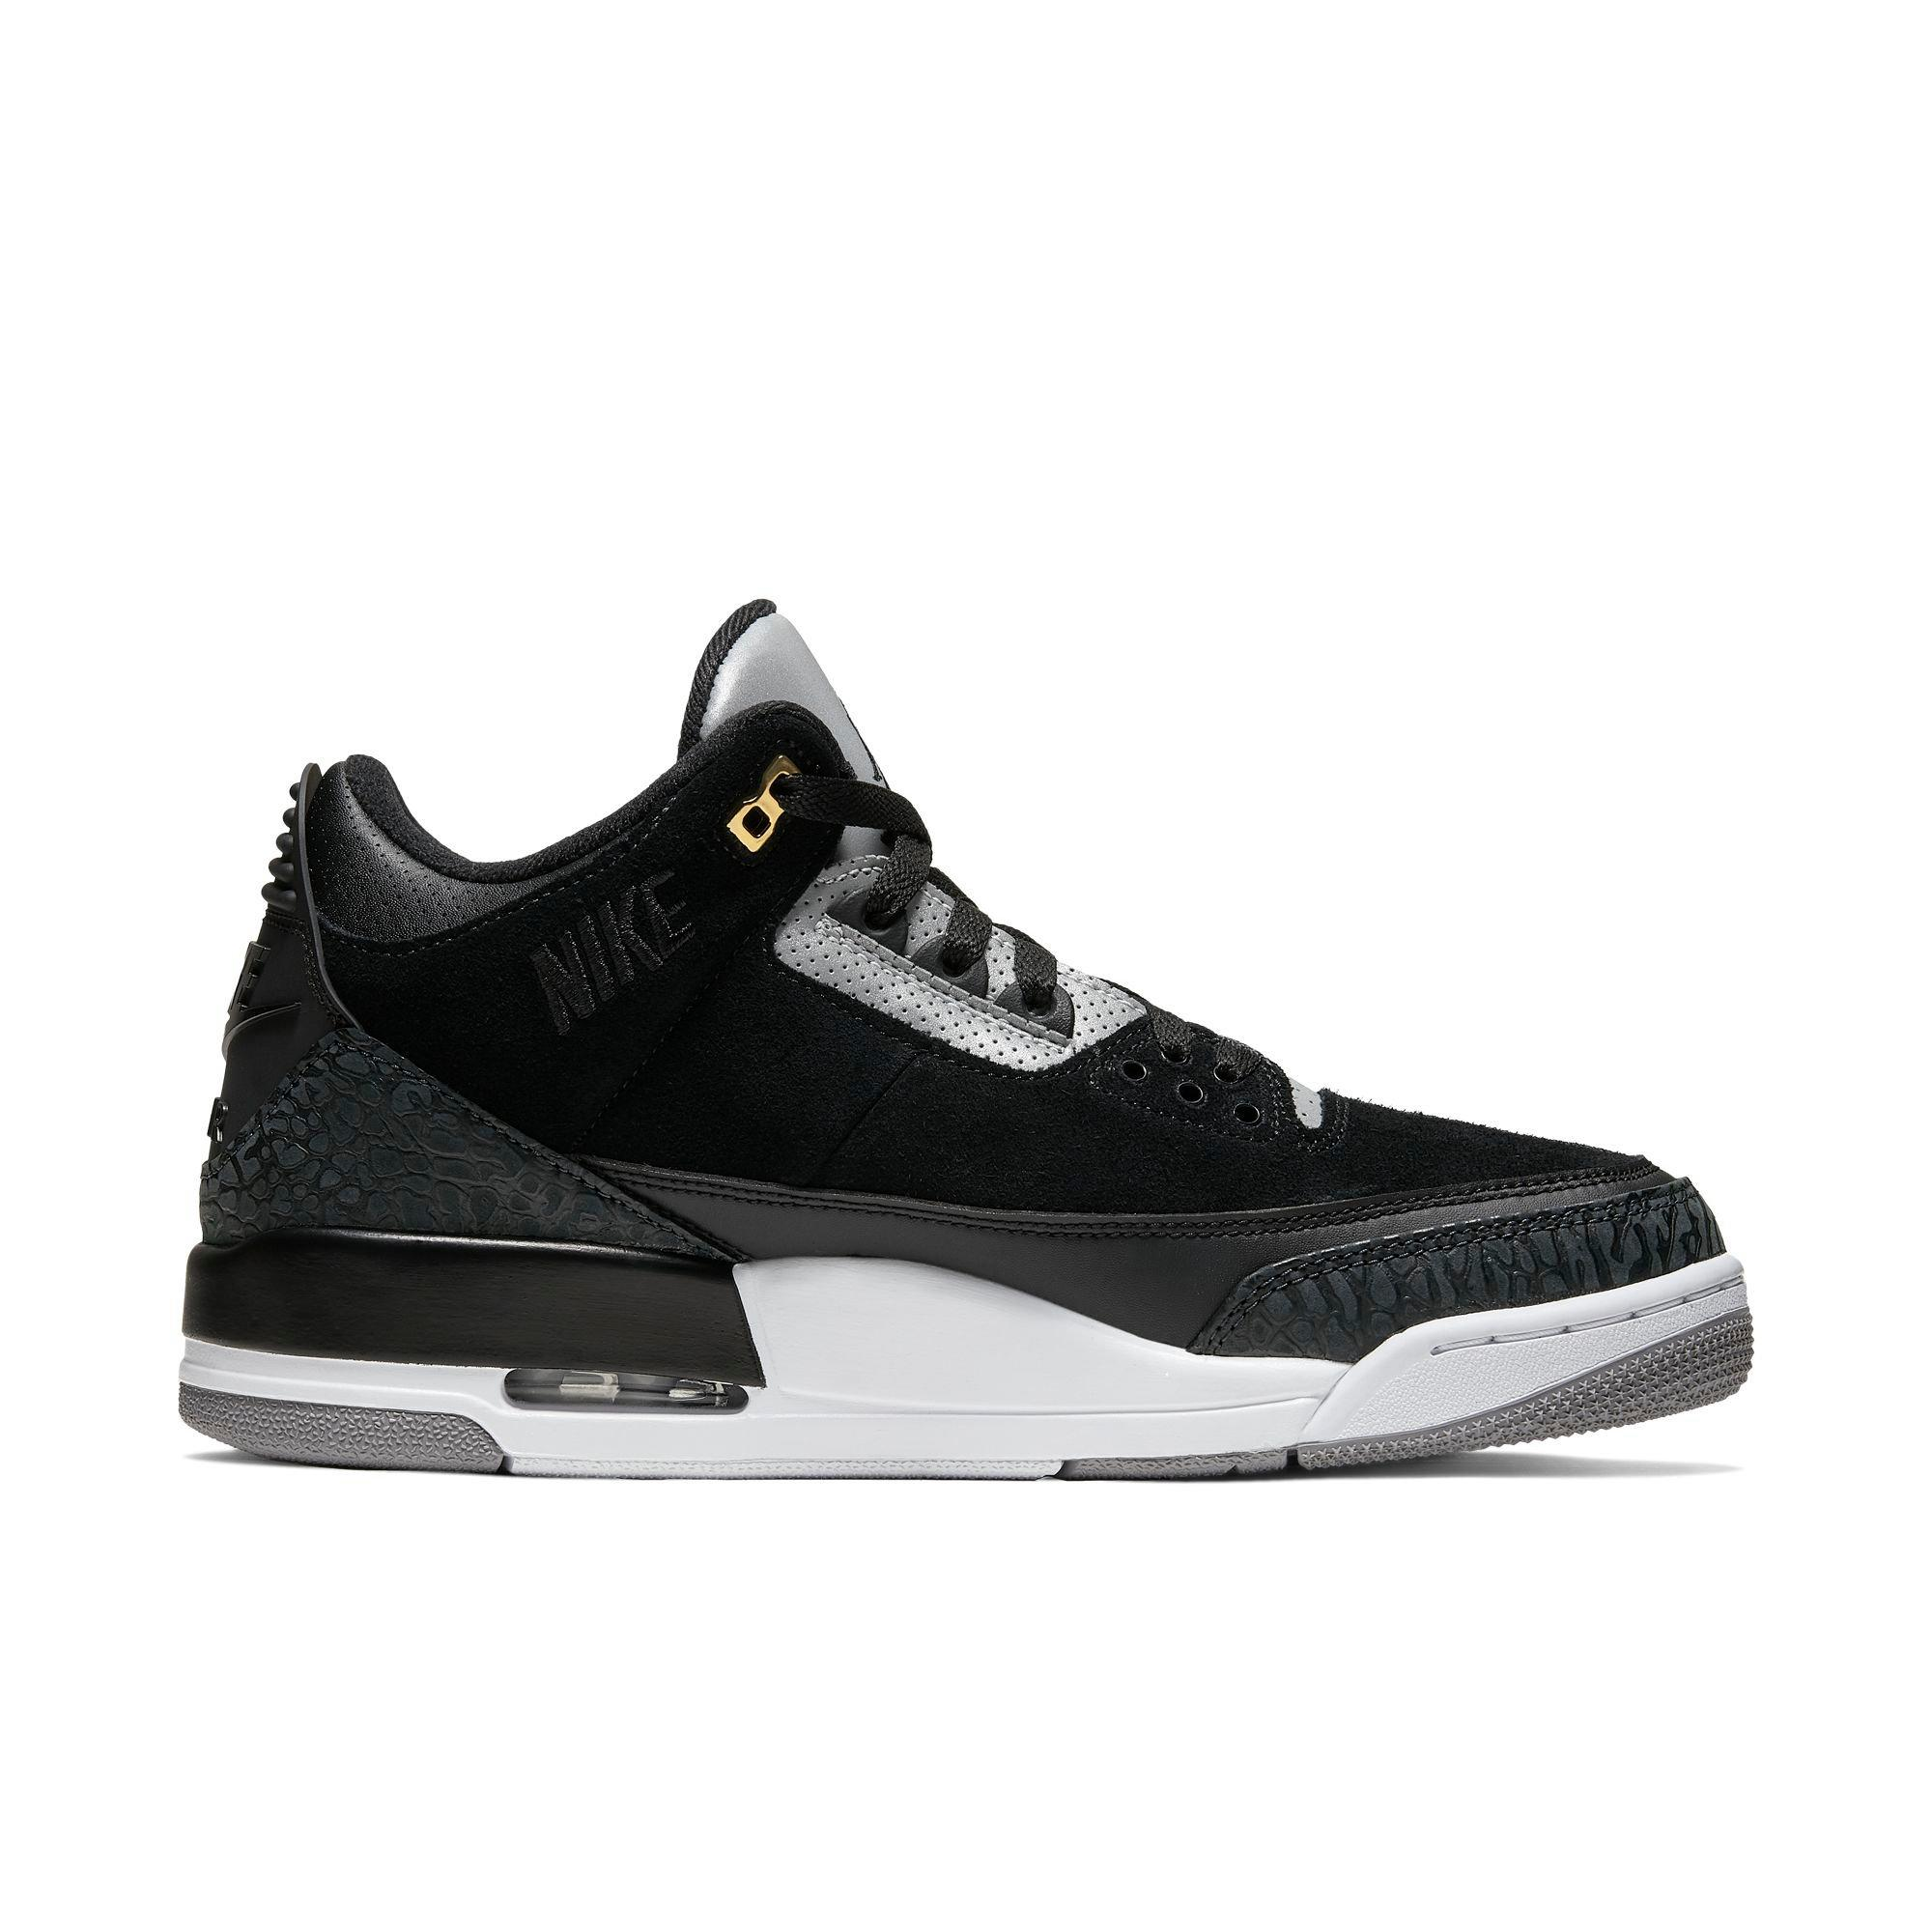 all black jordan 3